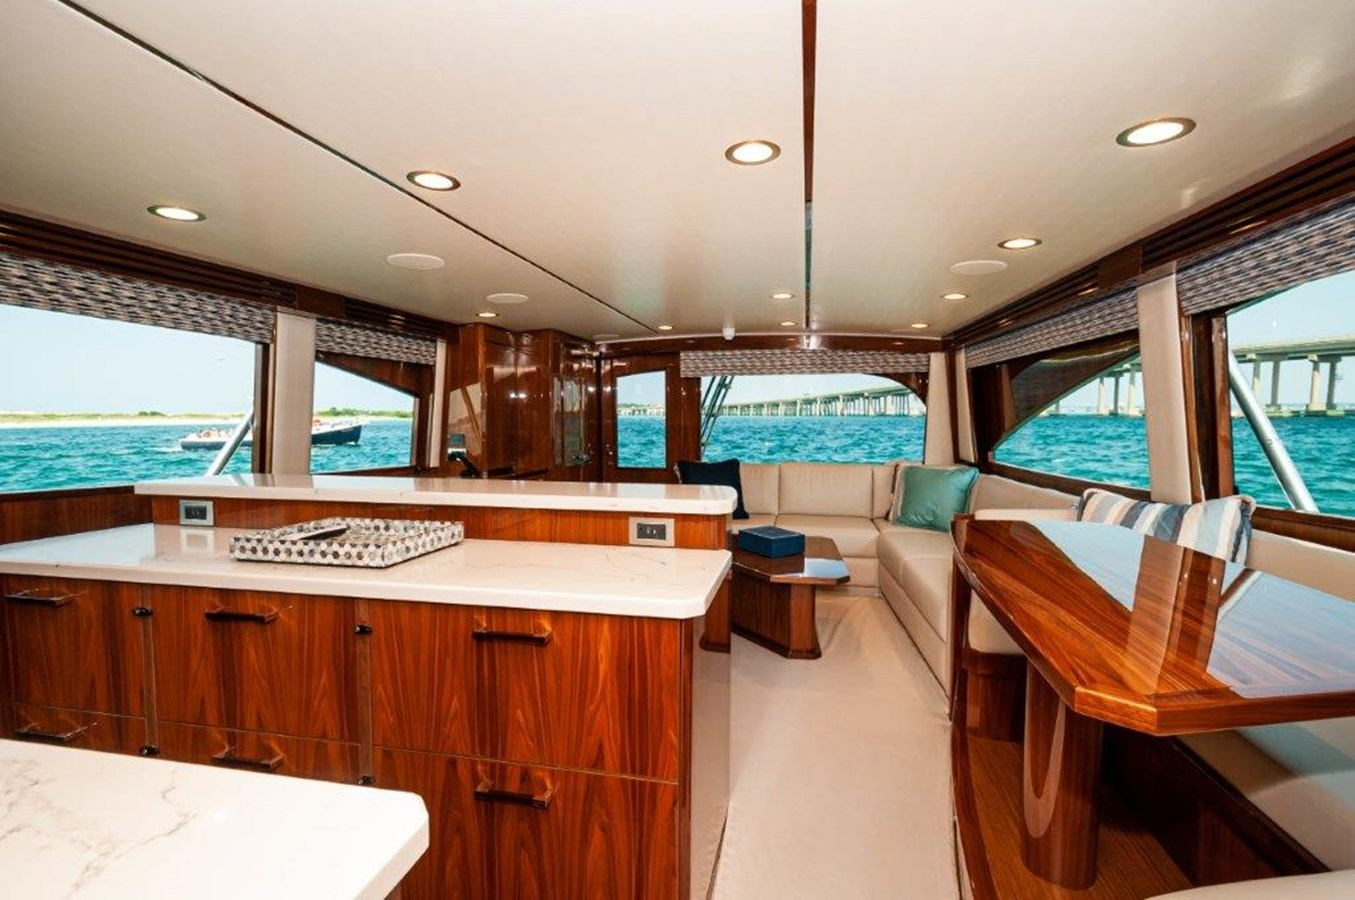 2019 68 Viking Convertible - Salon-4 2019 VIKING 68 Convertible Sport Fisherman 2560048